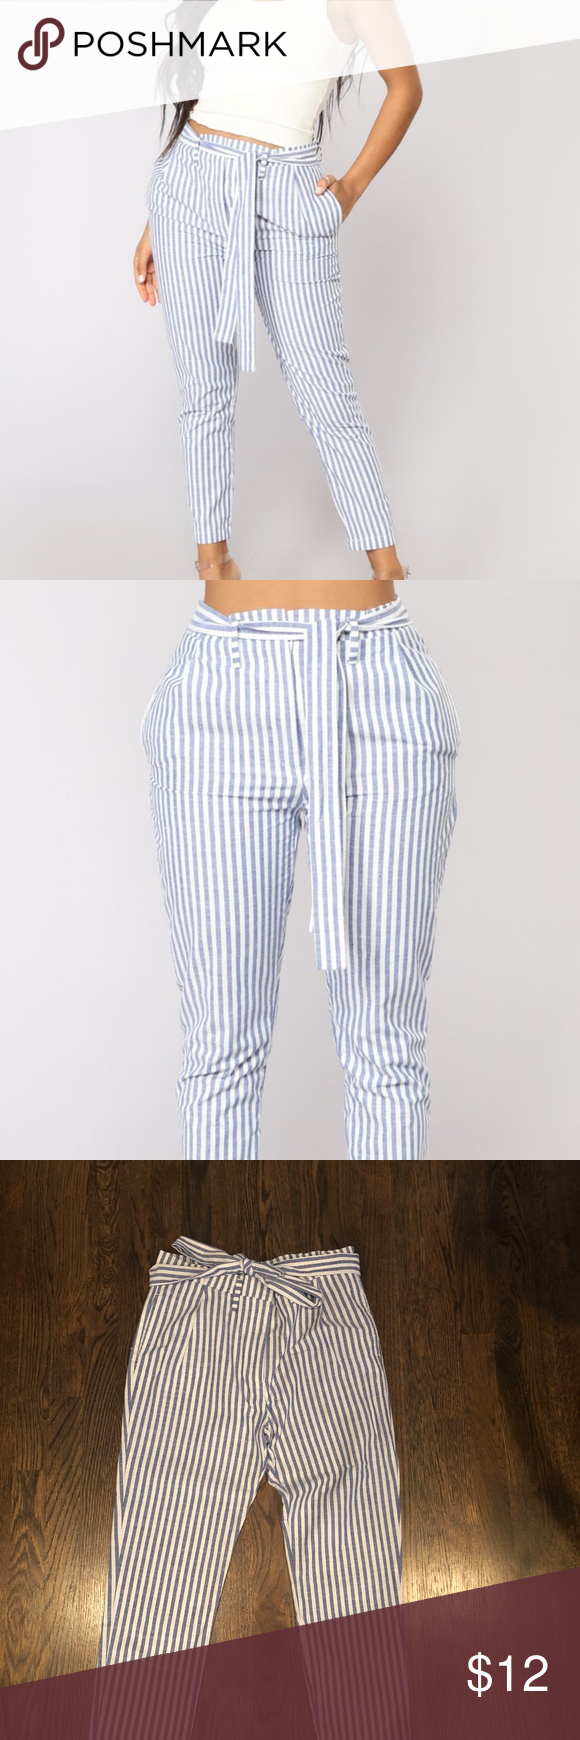 Fashion Nova Striped Pants Blue Fashion, Fashion nova